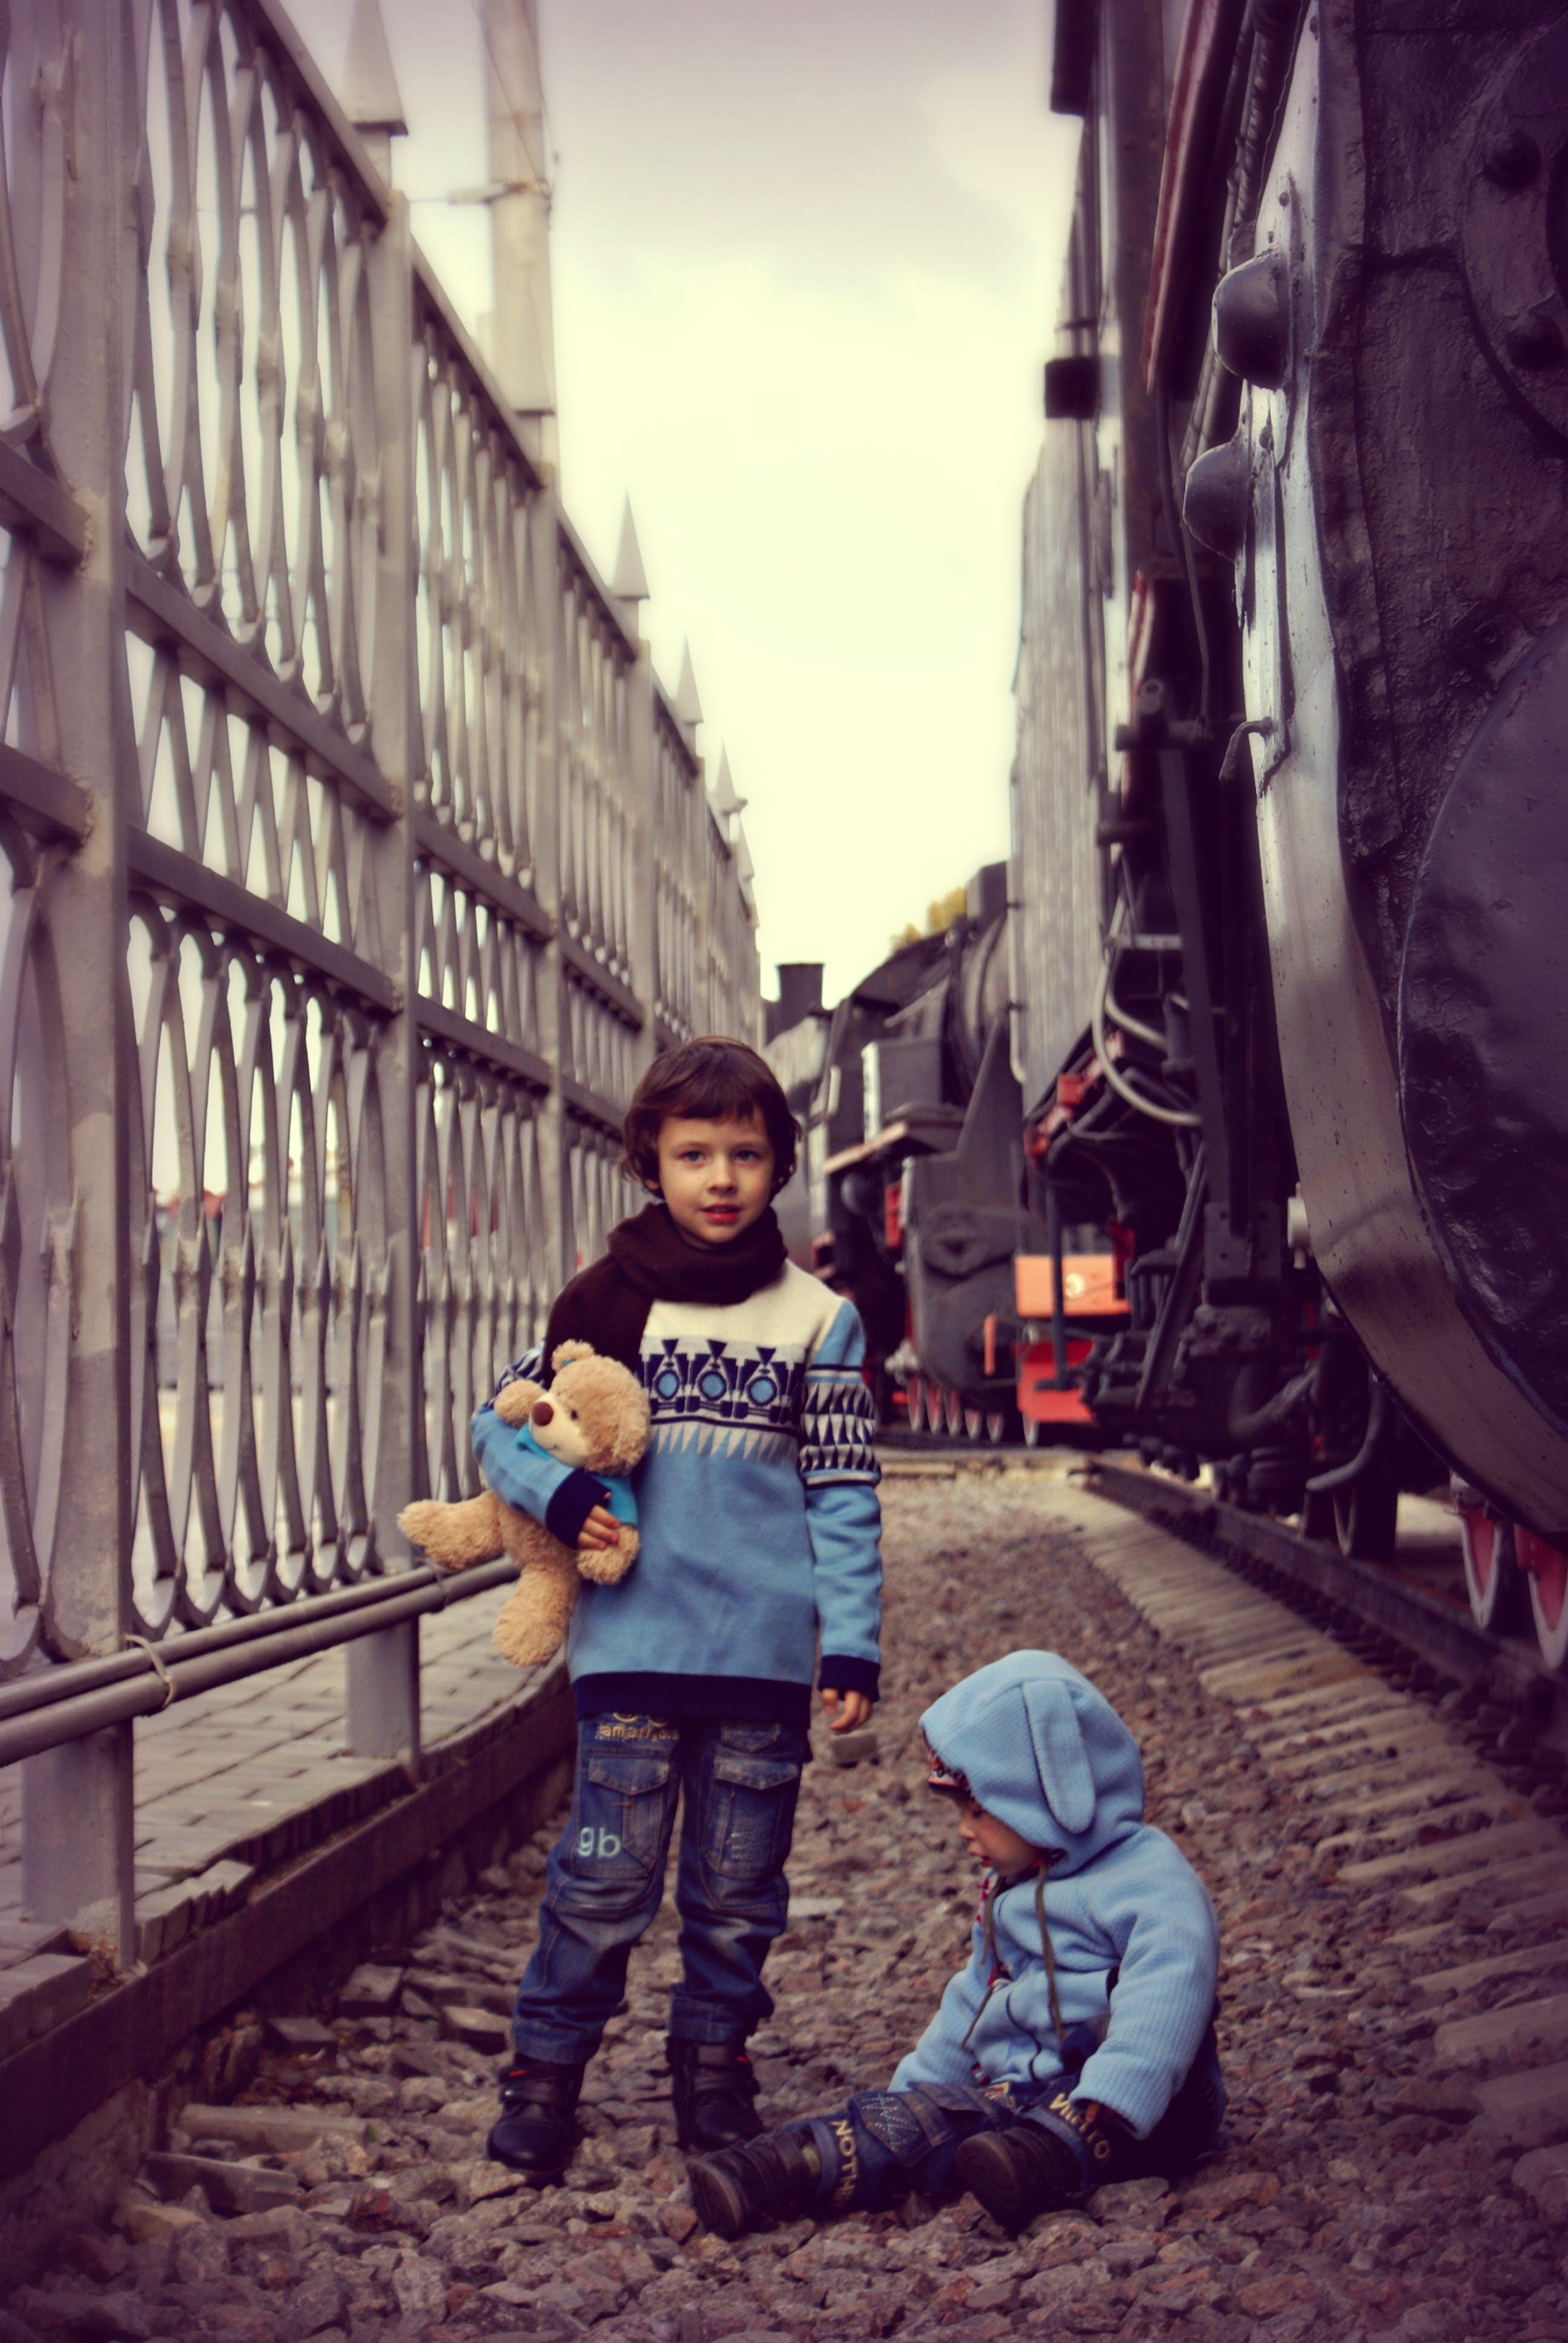 Boy Standing Beside Boy on Ground